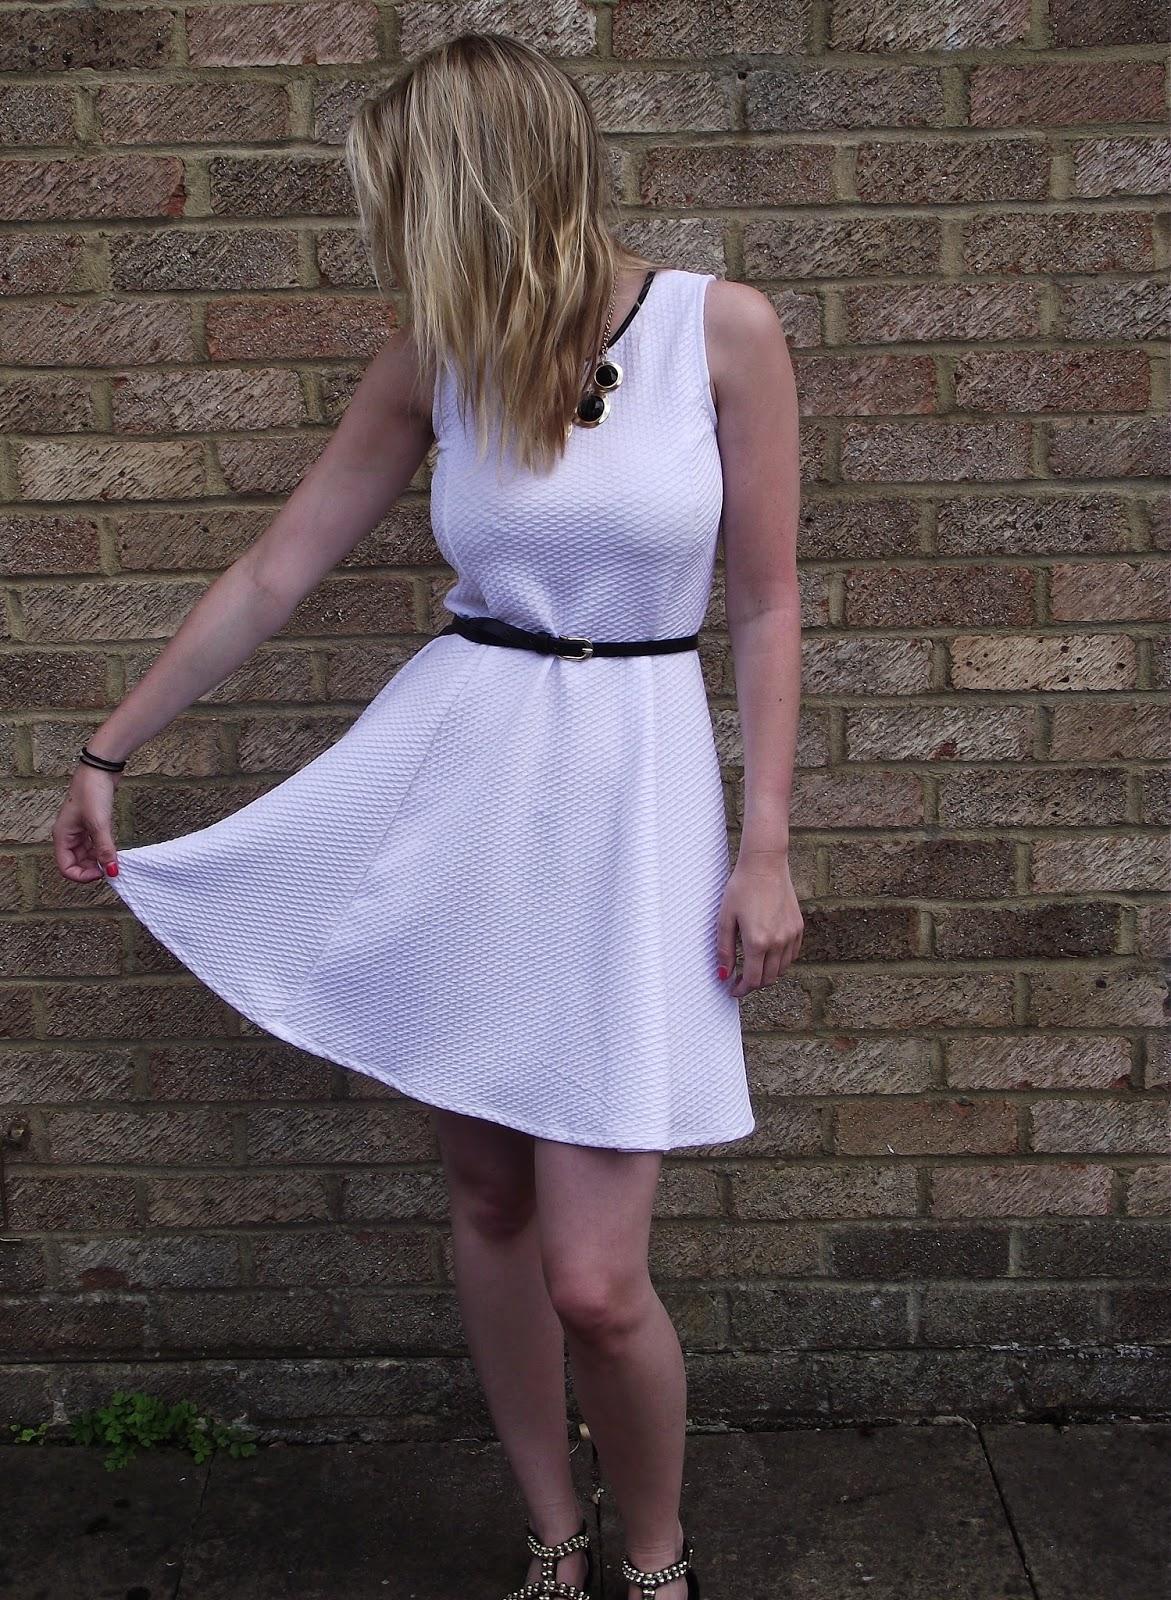 Outfit Post on Lrsmith-Fashion fashion blog.